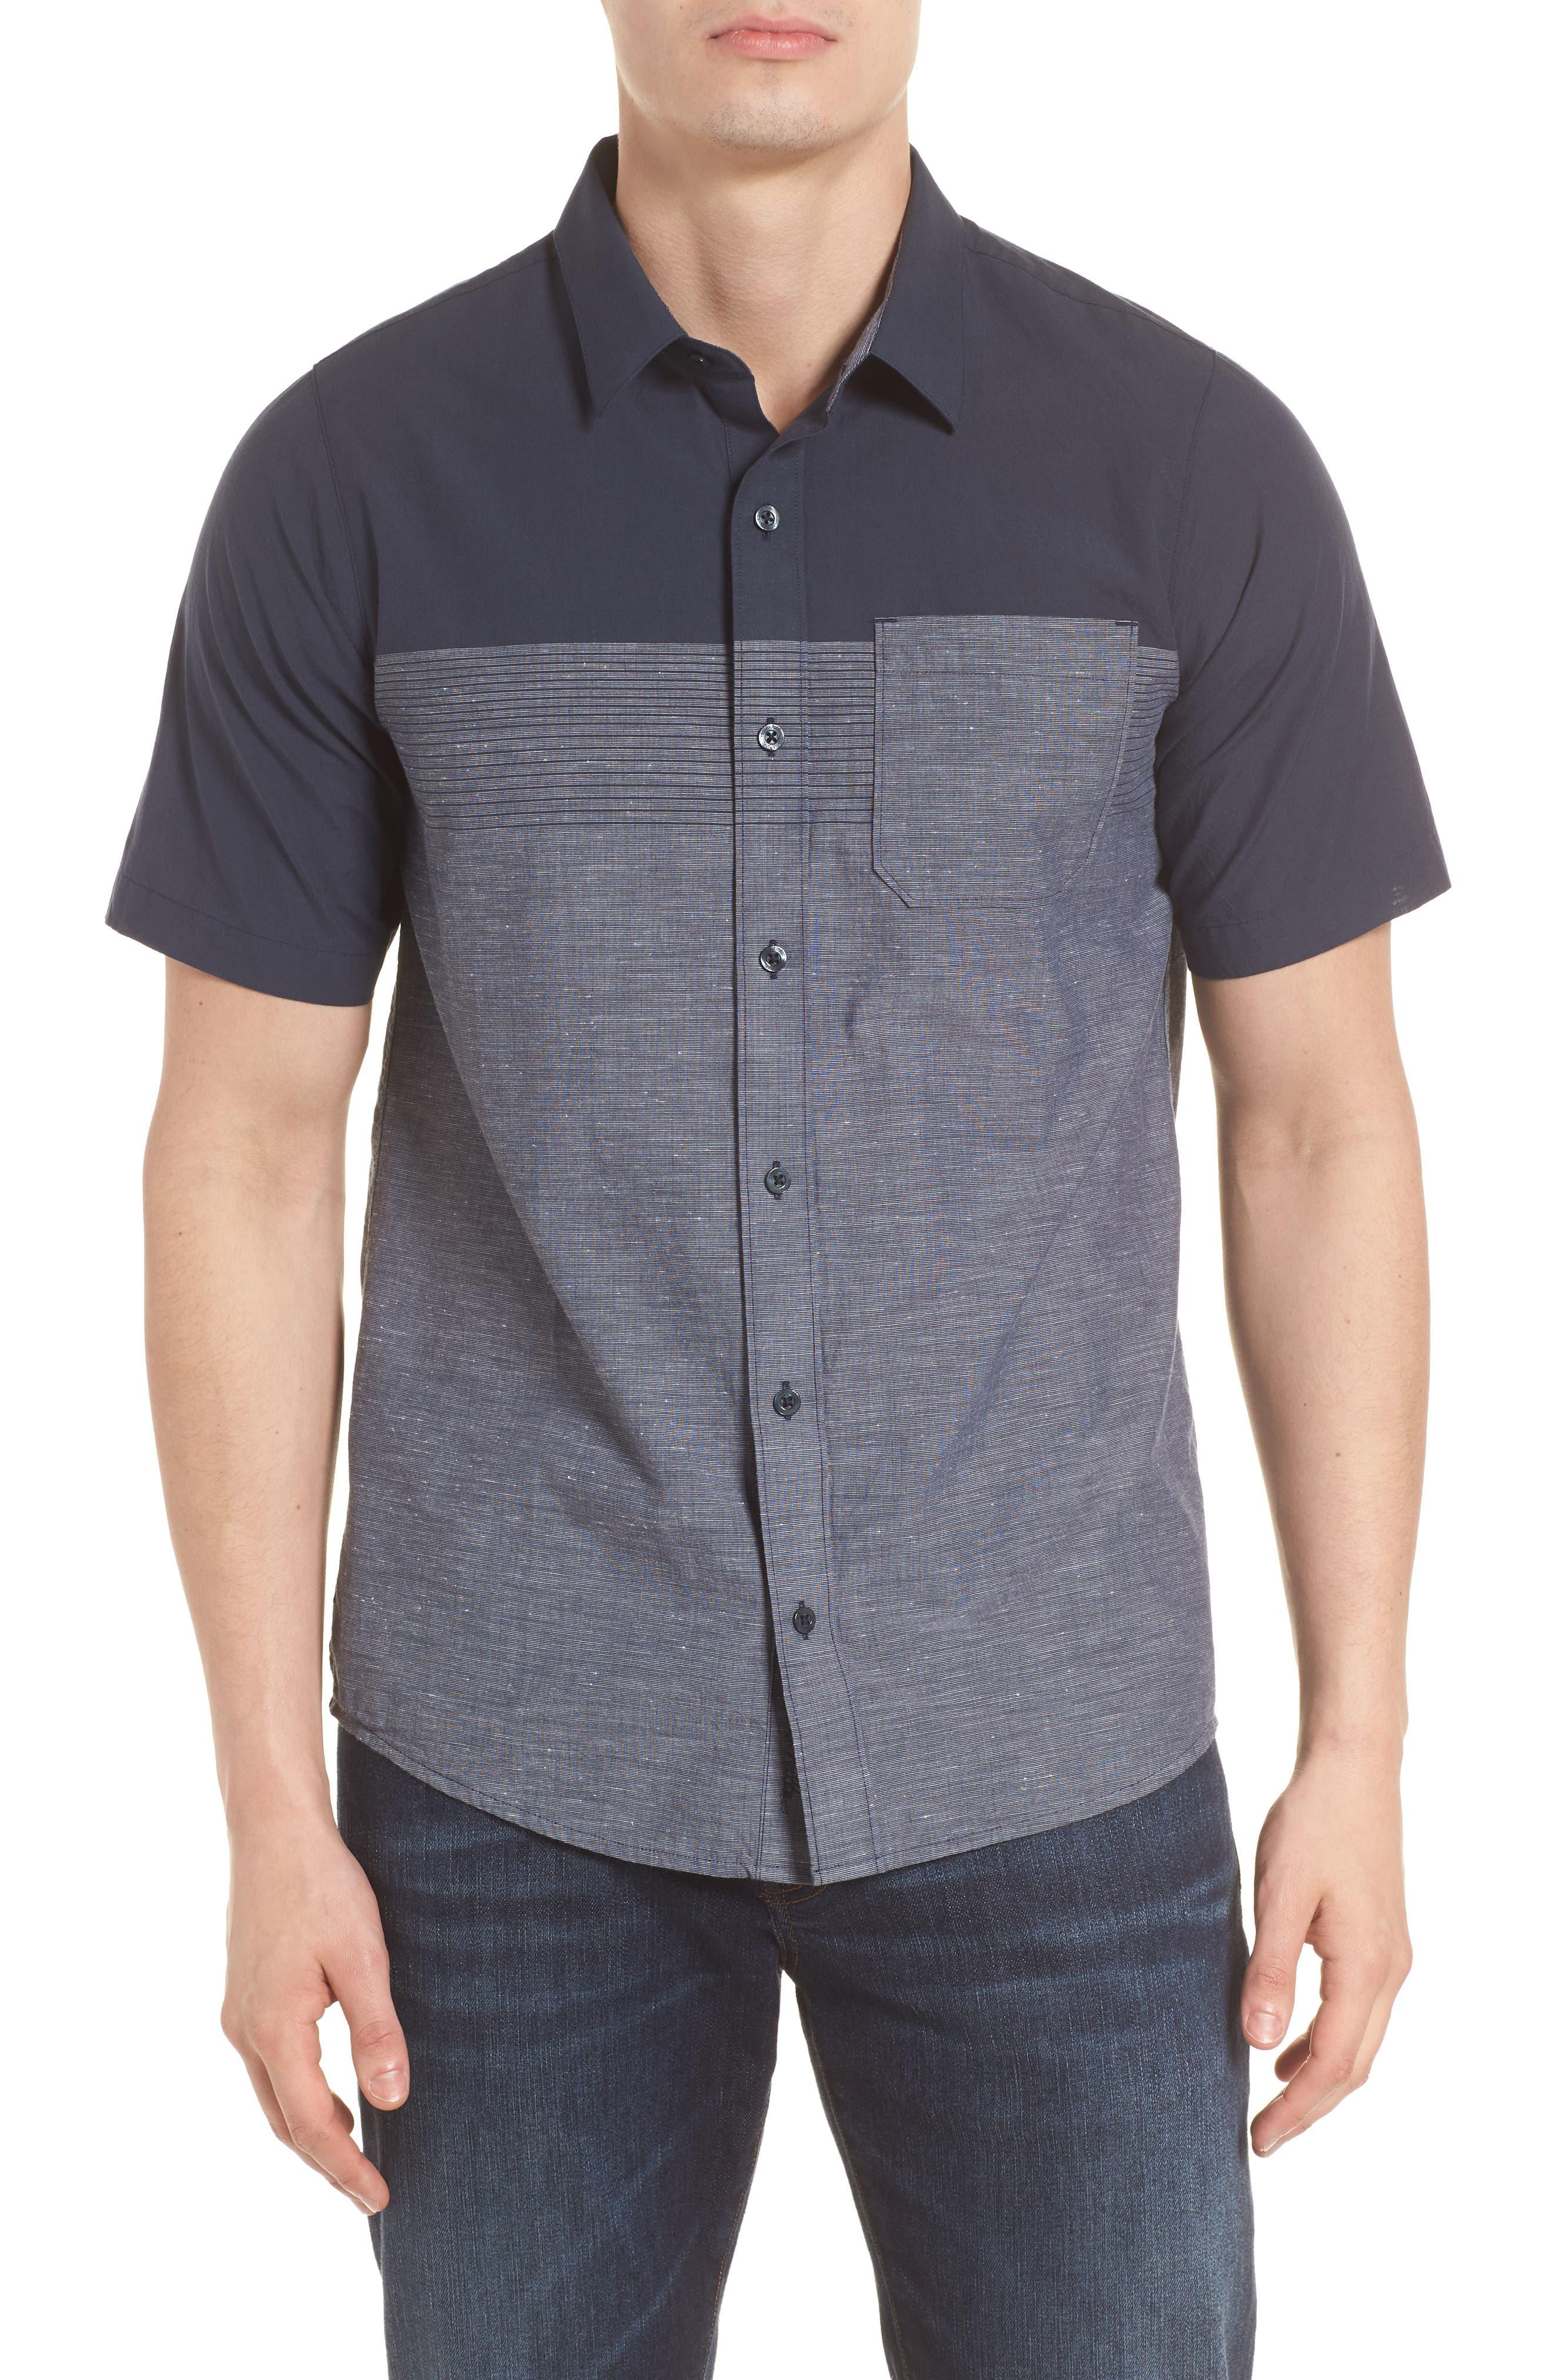 Travis Mathew Charlie Pinstripe Woven Shirt